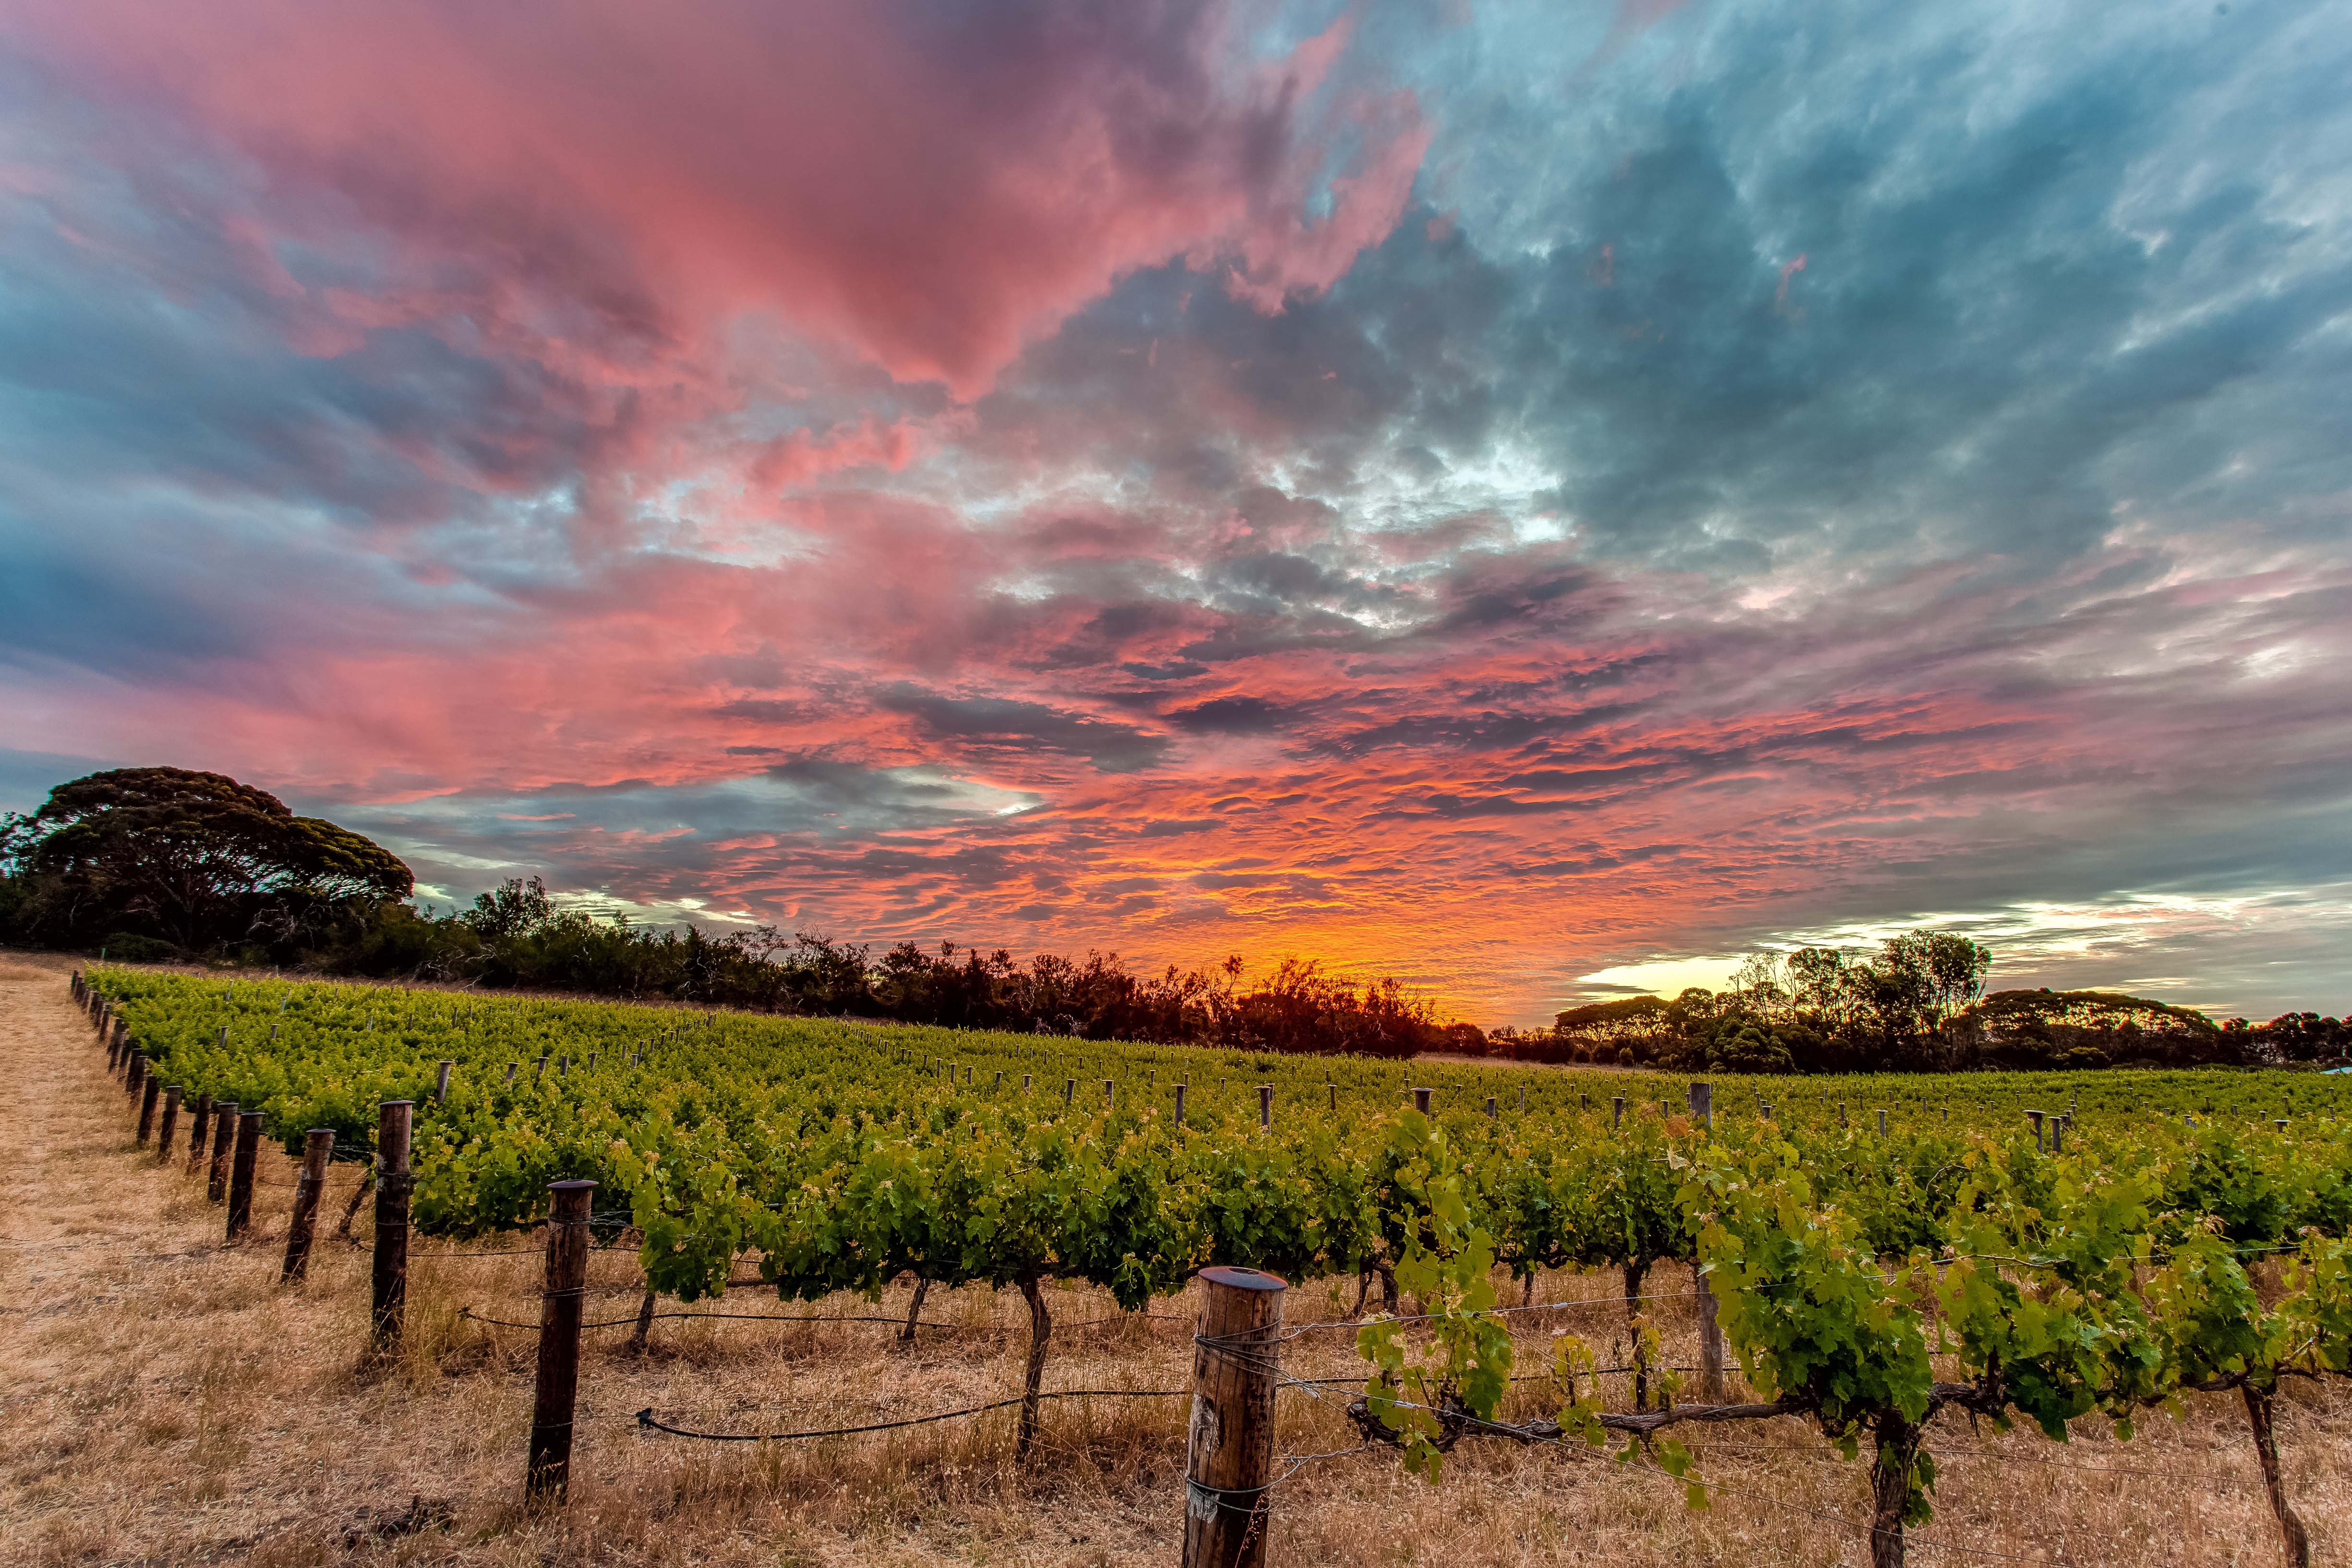 Vineyard_Chapman River